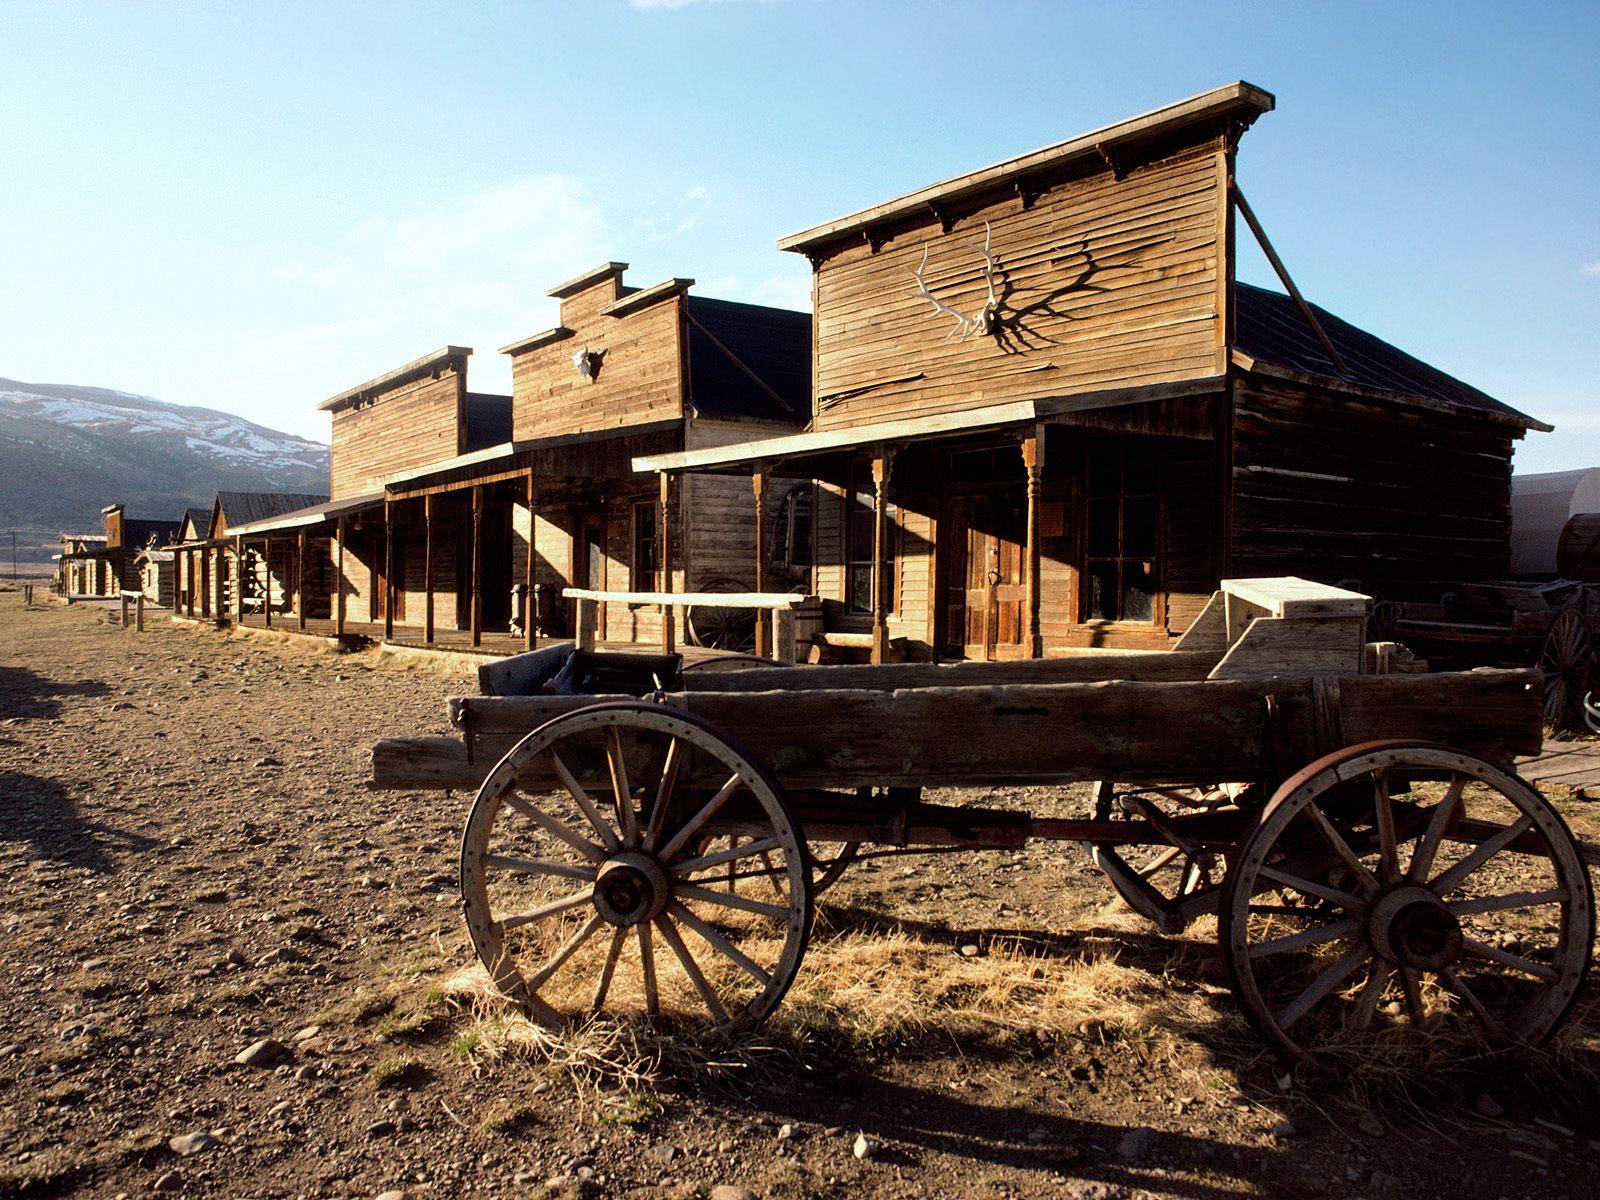 old-town-fork-near-silverton-colorado-bodie-ghost-california-458179